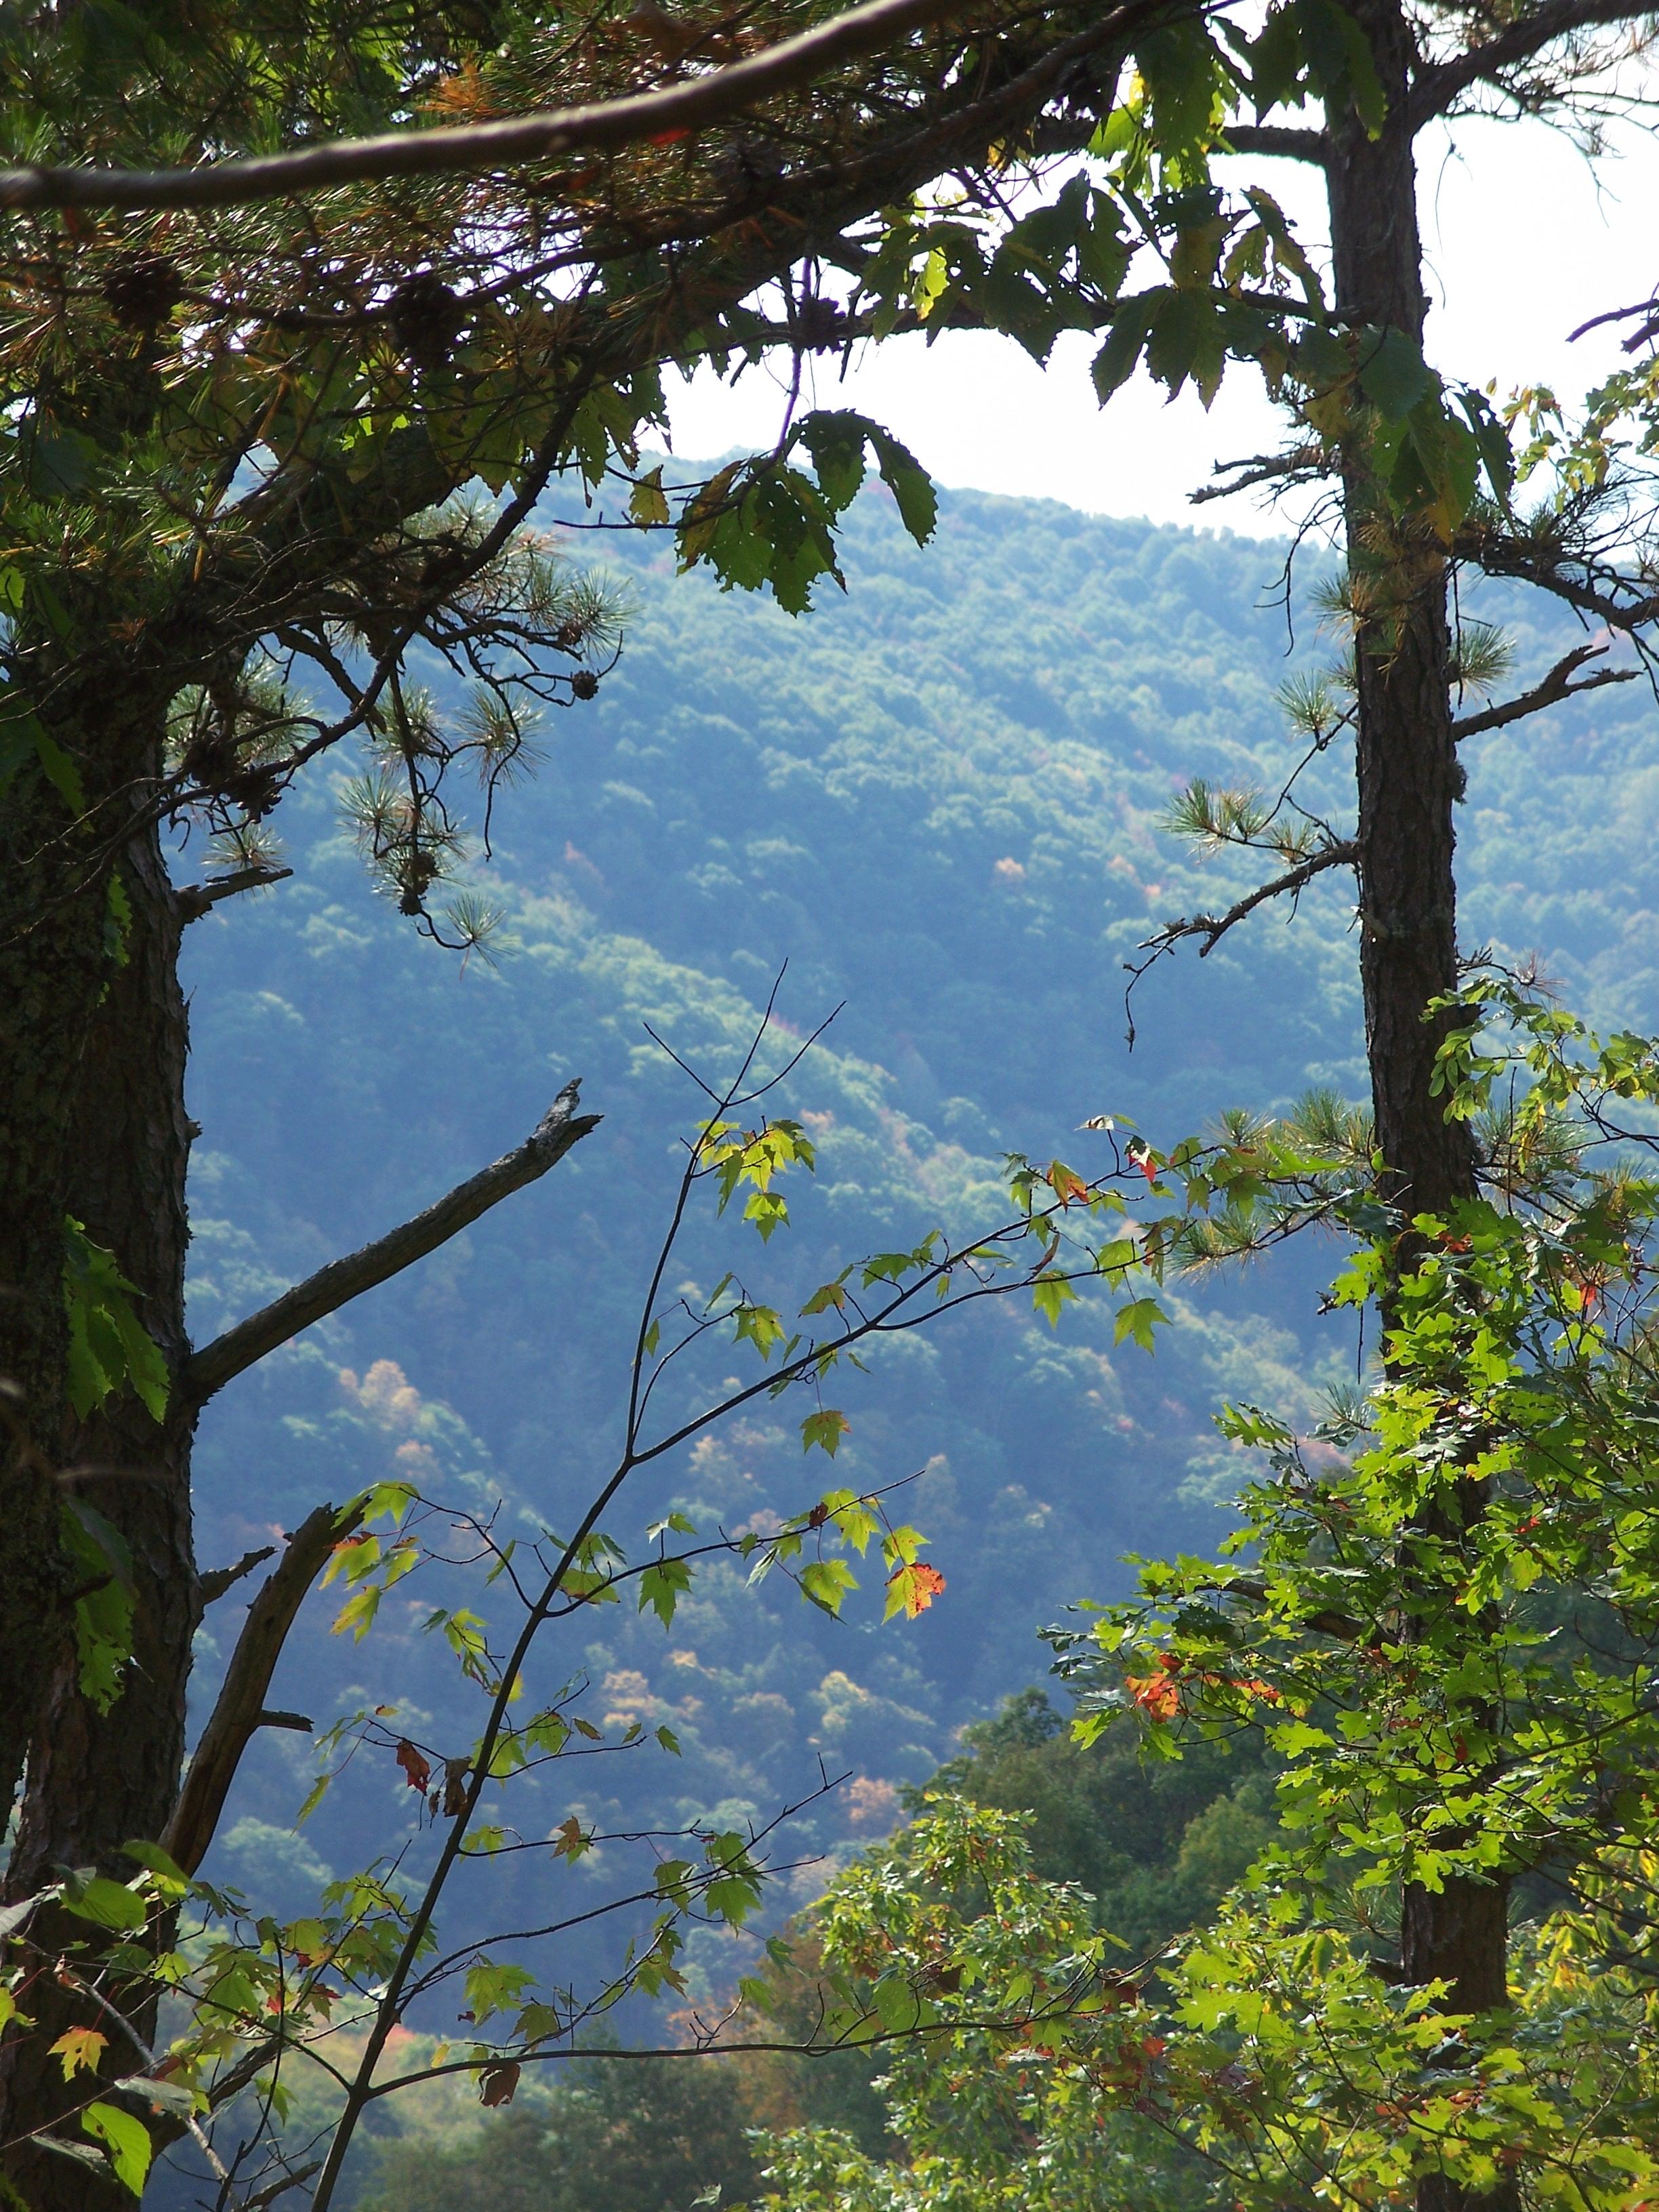 Descending into Beaver Creek Gorge - By Doug Wood